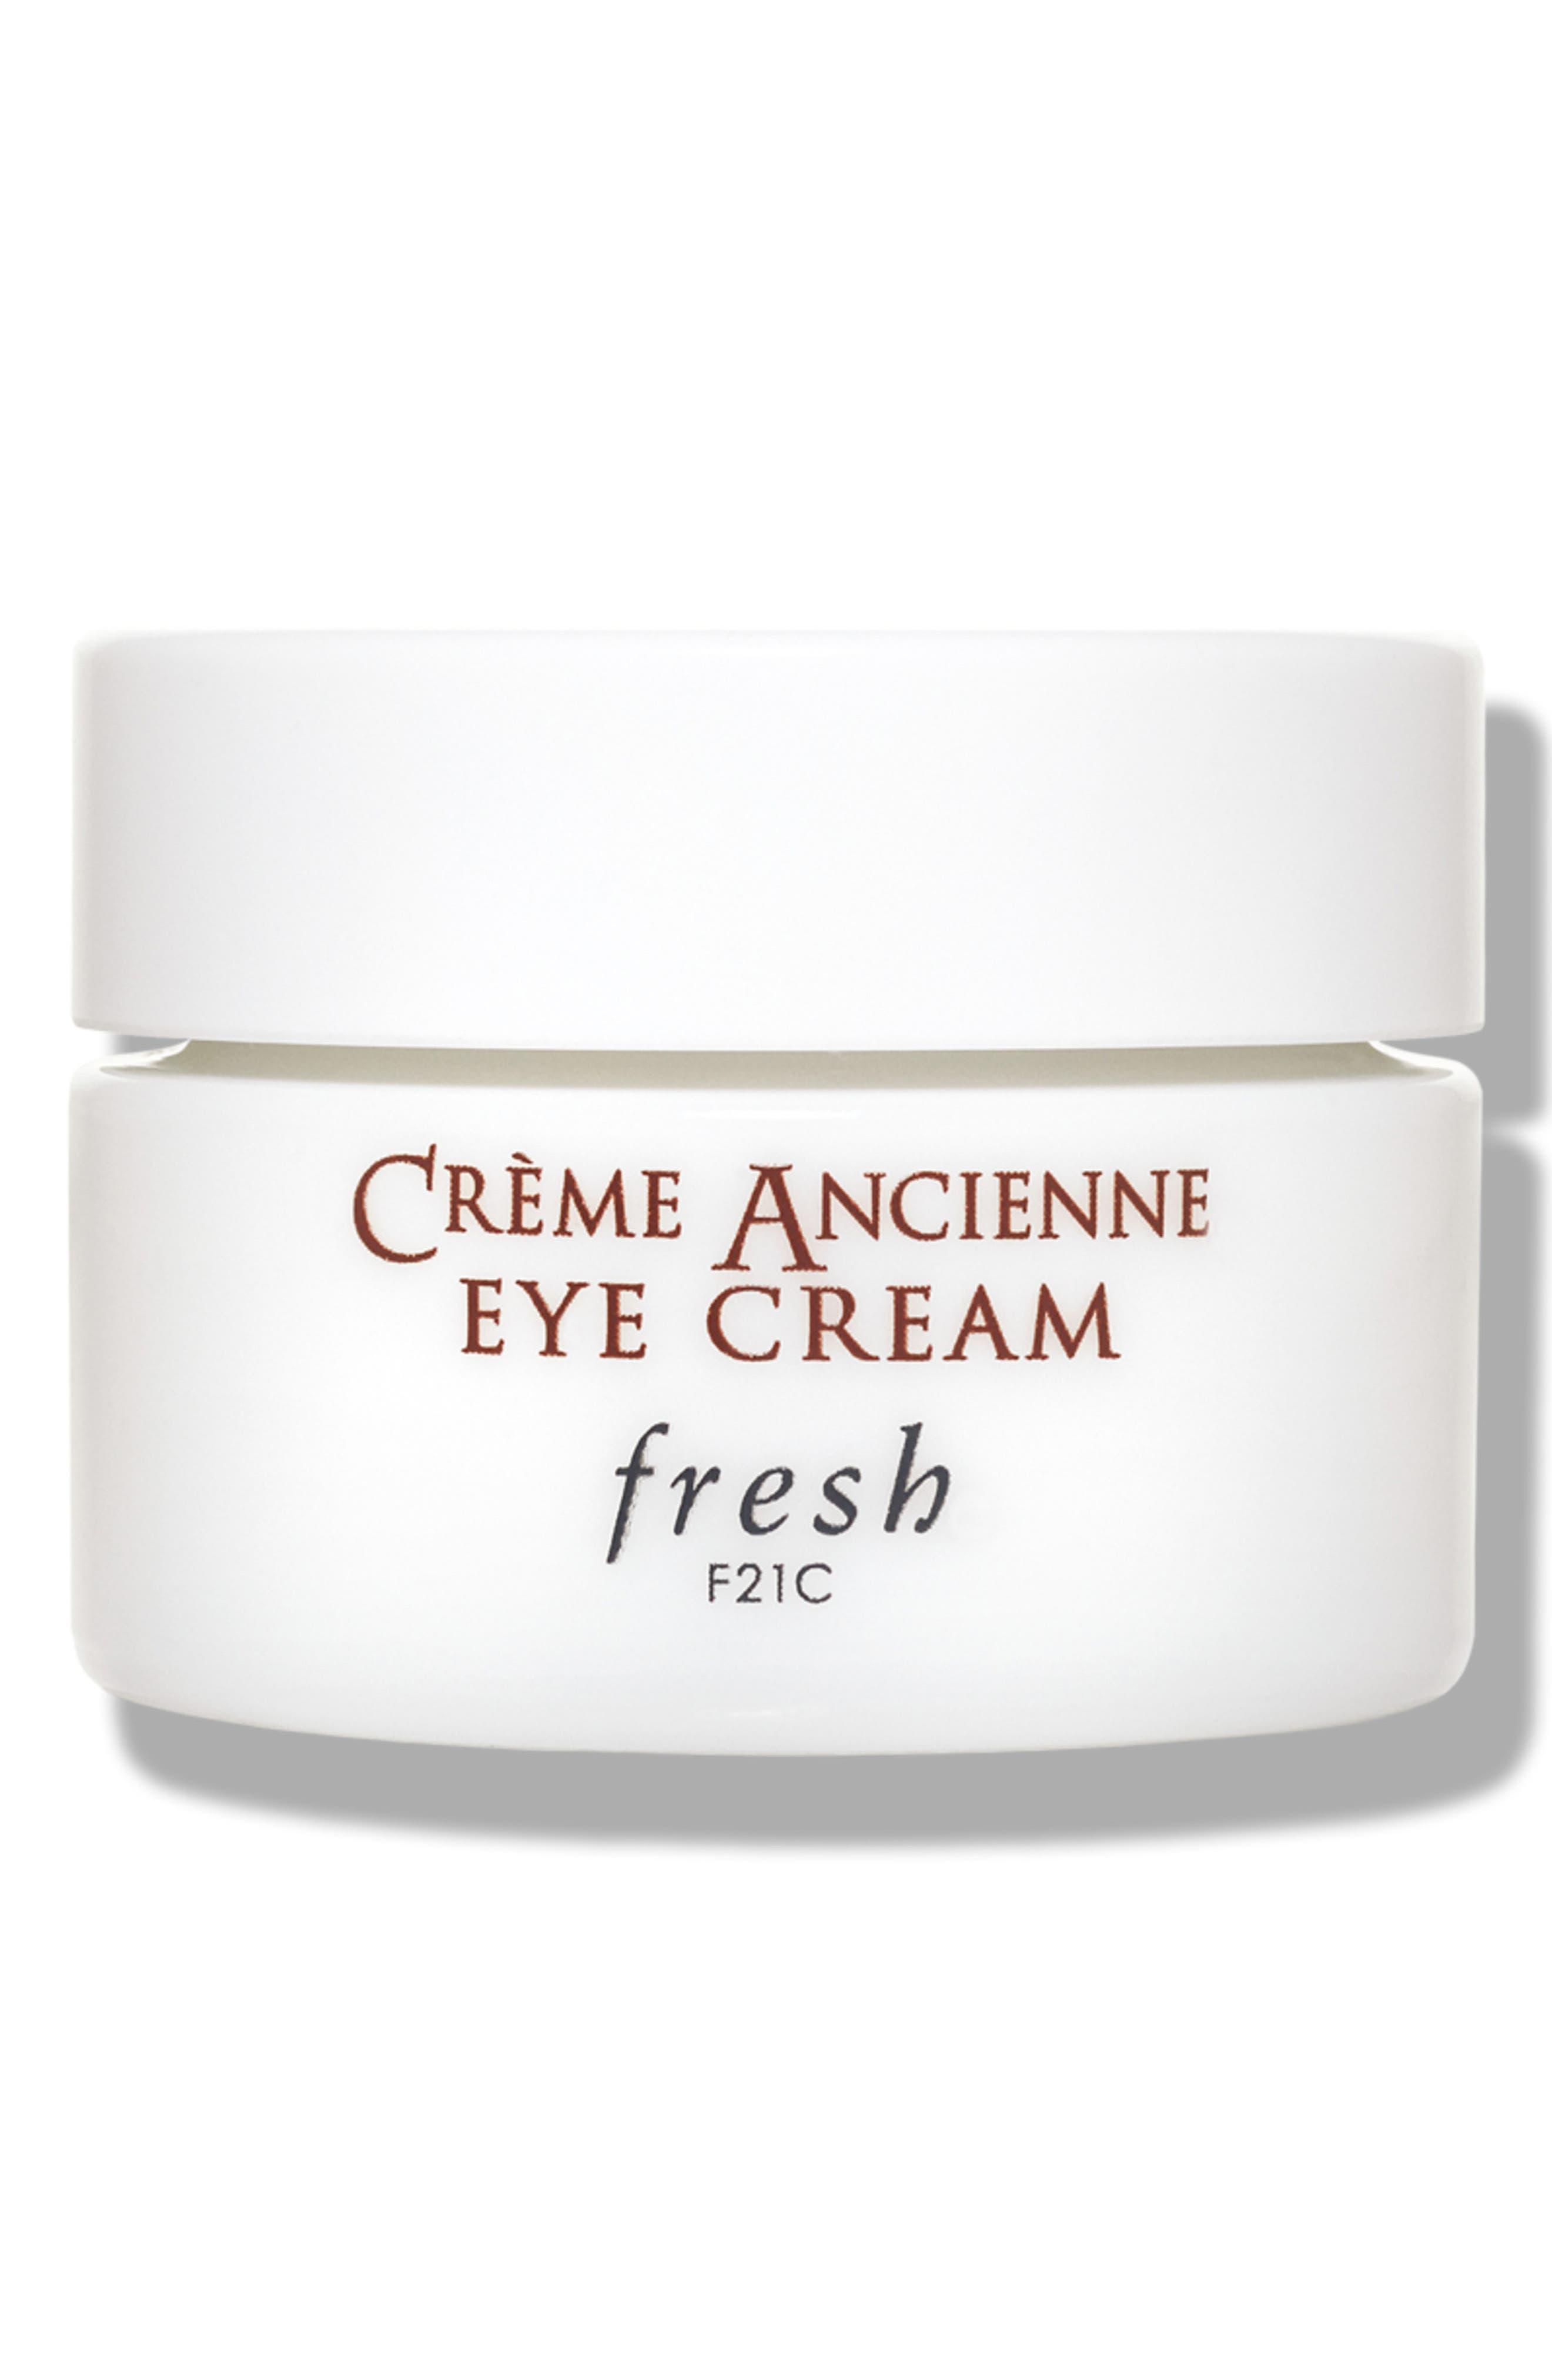 Fresh Creme Ancienne Eye Cream